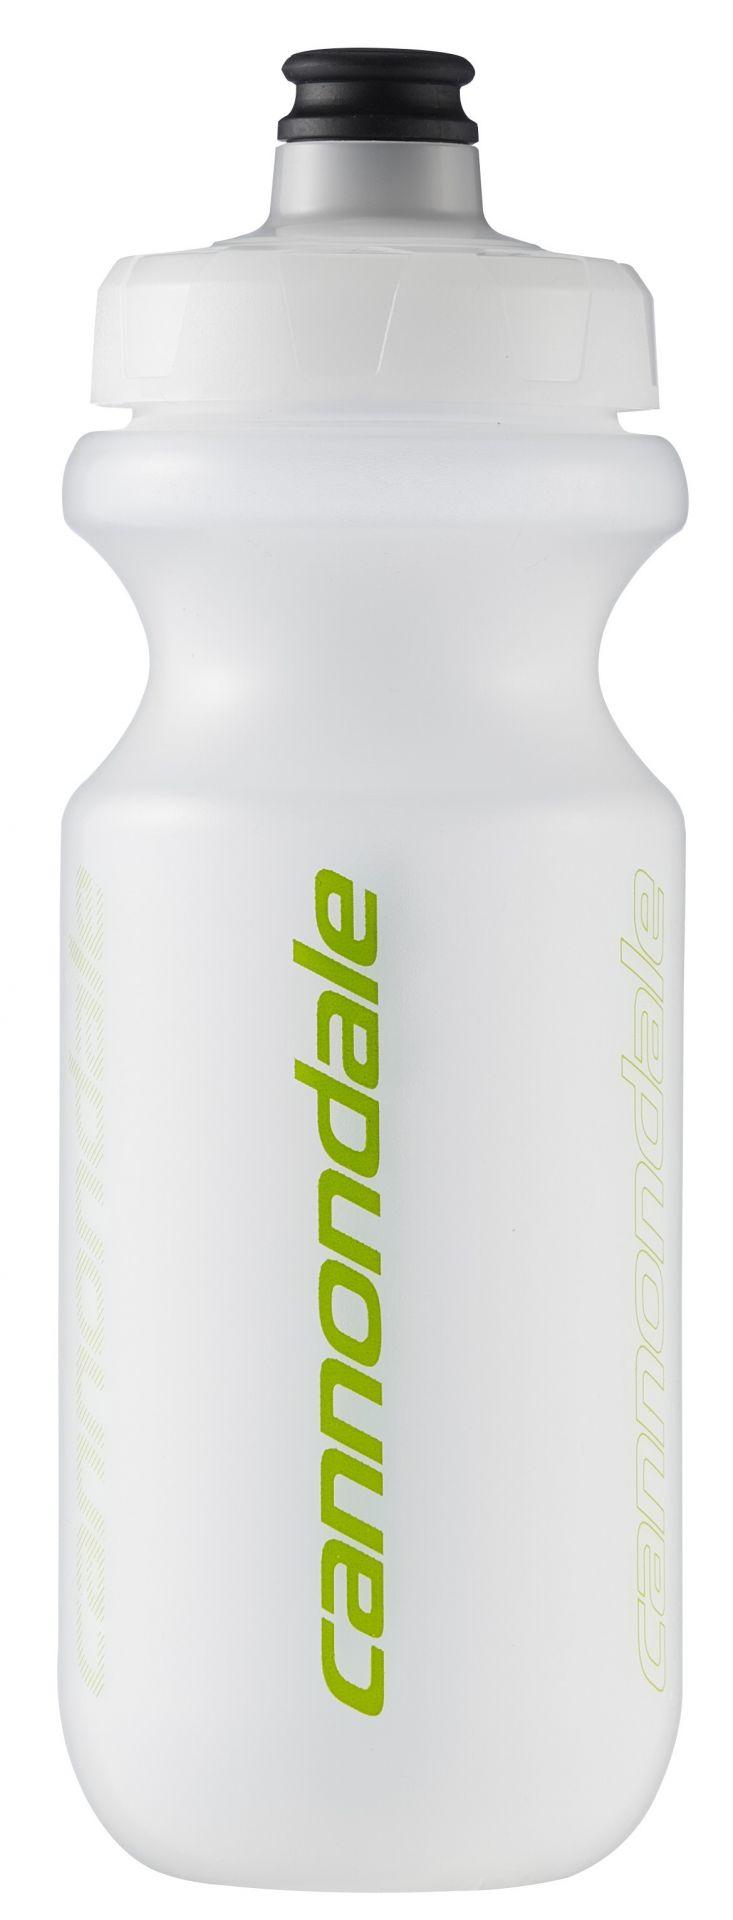 Bidon Cannondale Logo Fade Trans 500 ml Transparent/Vert